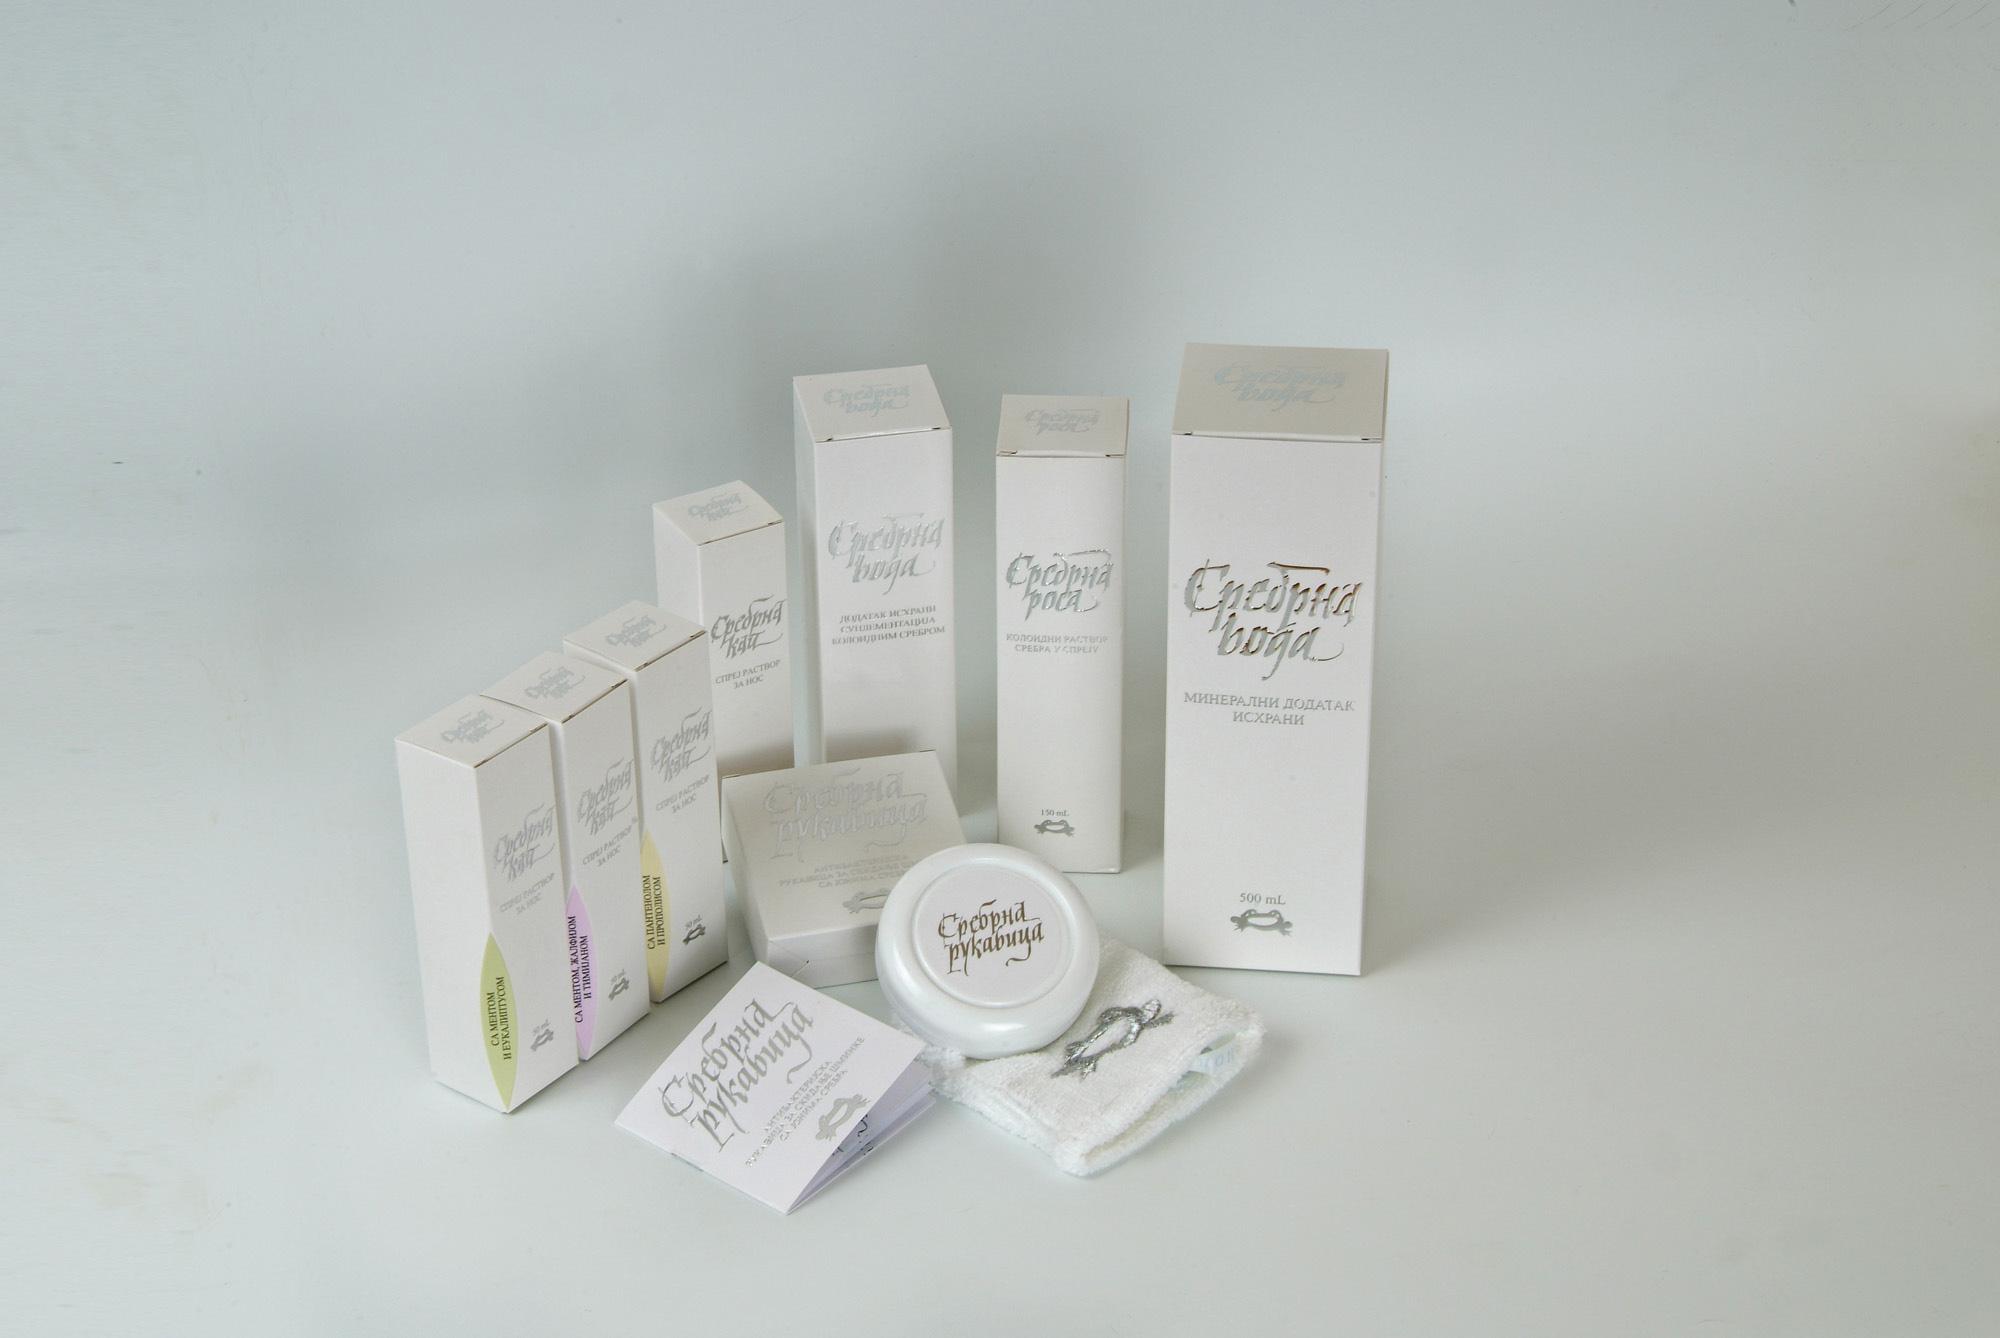 Kilmulis design - Koloid - packaging 03